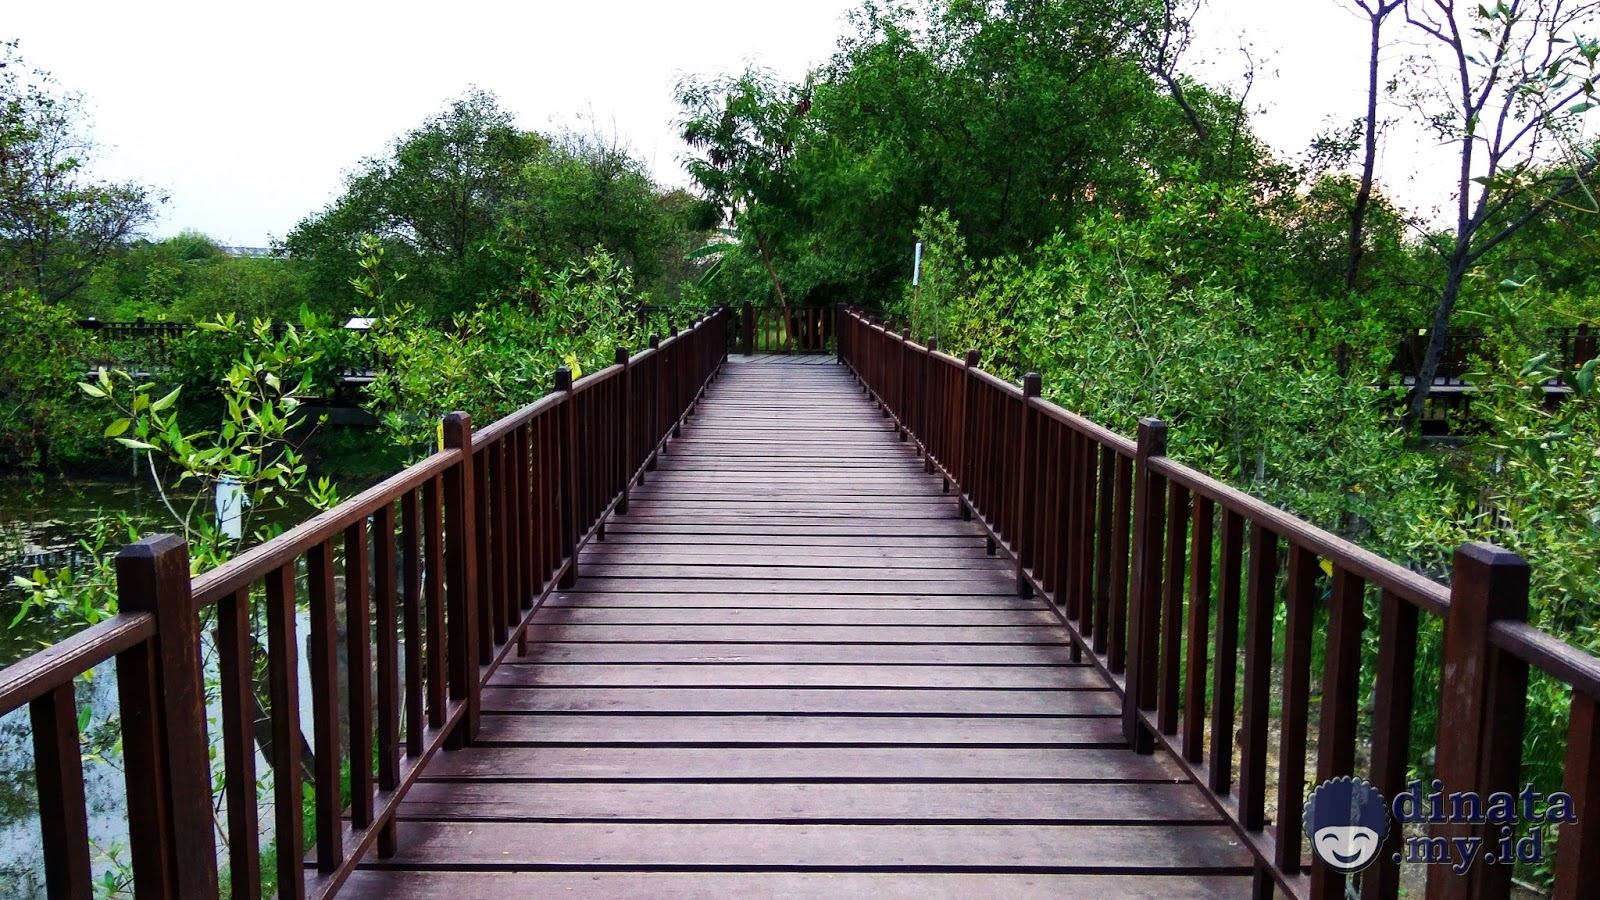 Hutan Mangrove Wonorejo Surabaya Rimbunnya Bakau Dinata Wisata Kota